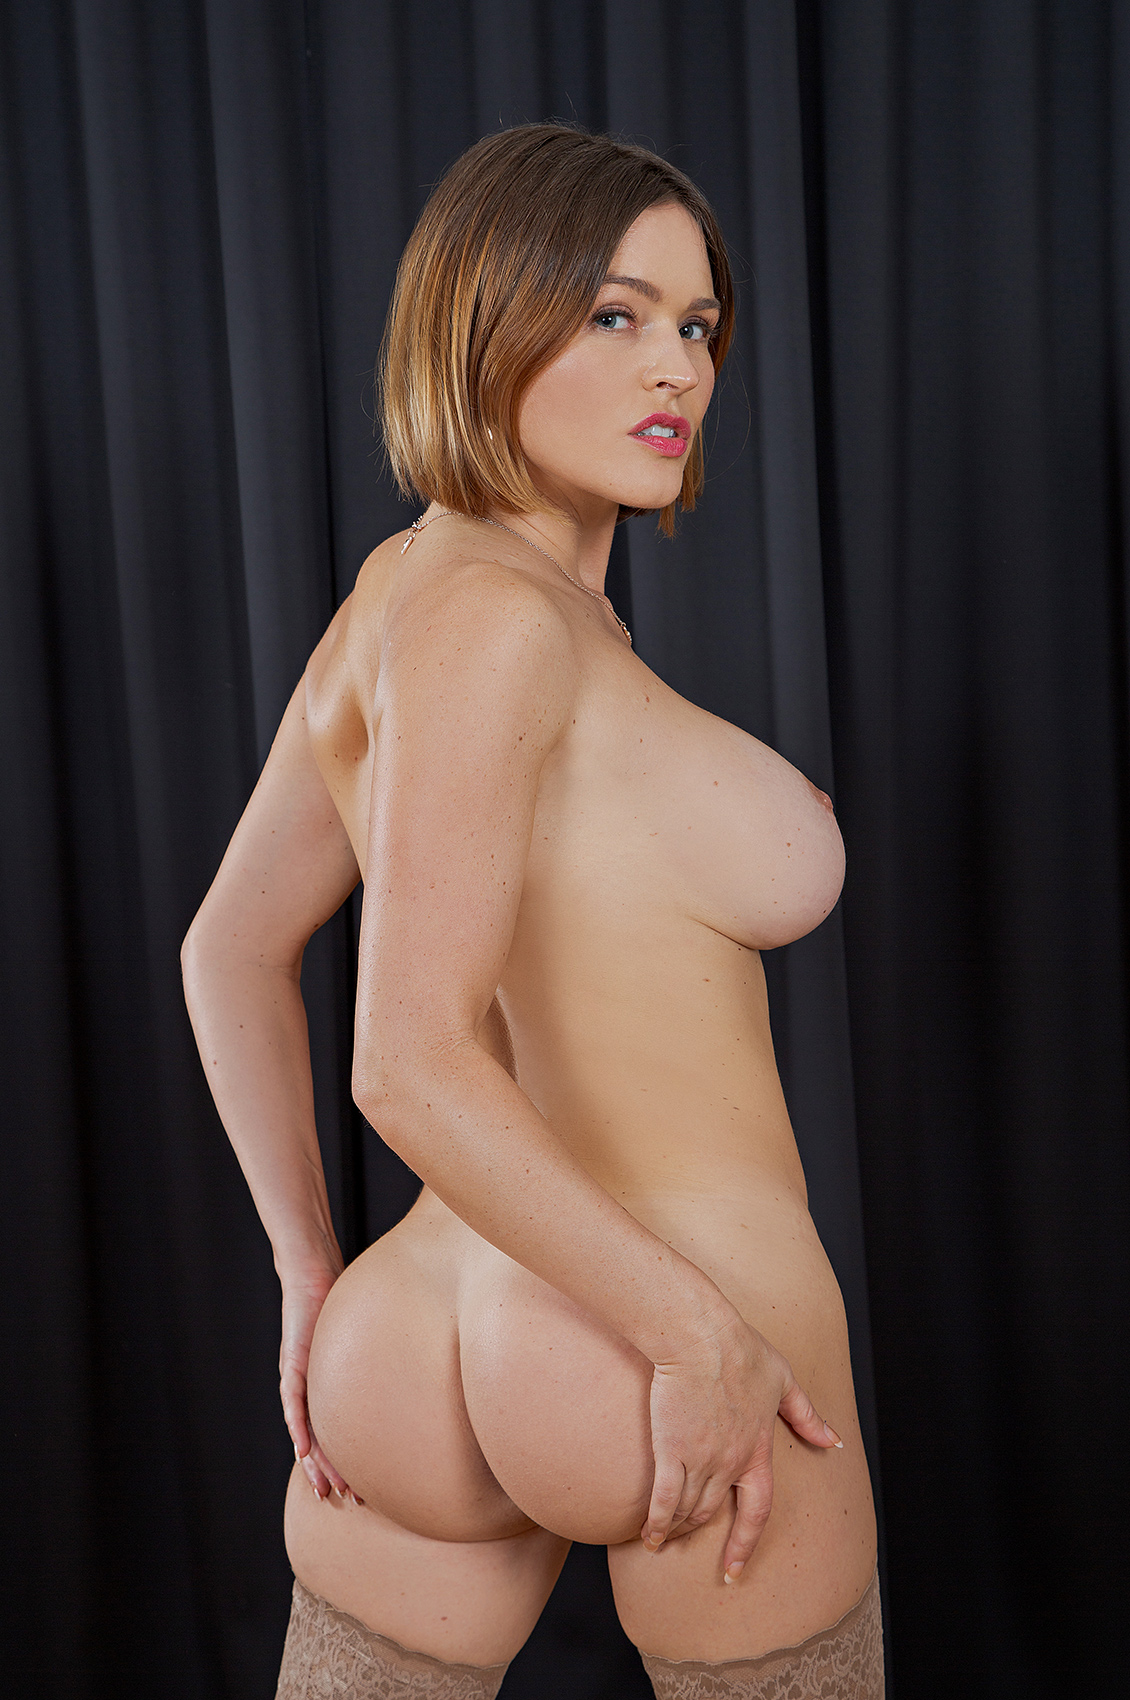 Krissy Lynn's VR Porn Videos, Bio & Free Nude Pics